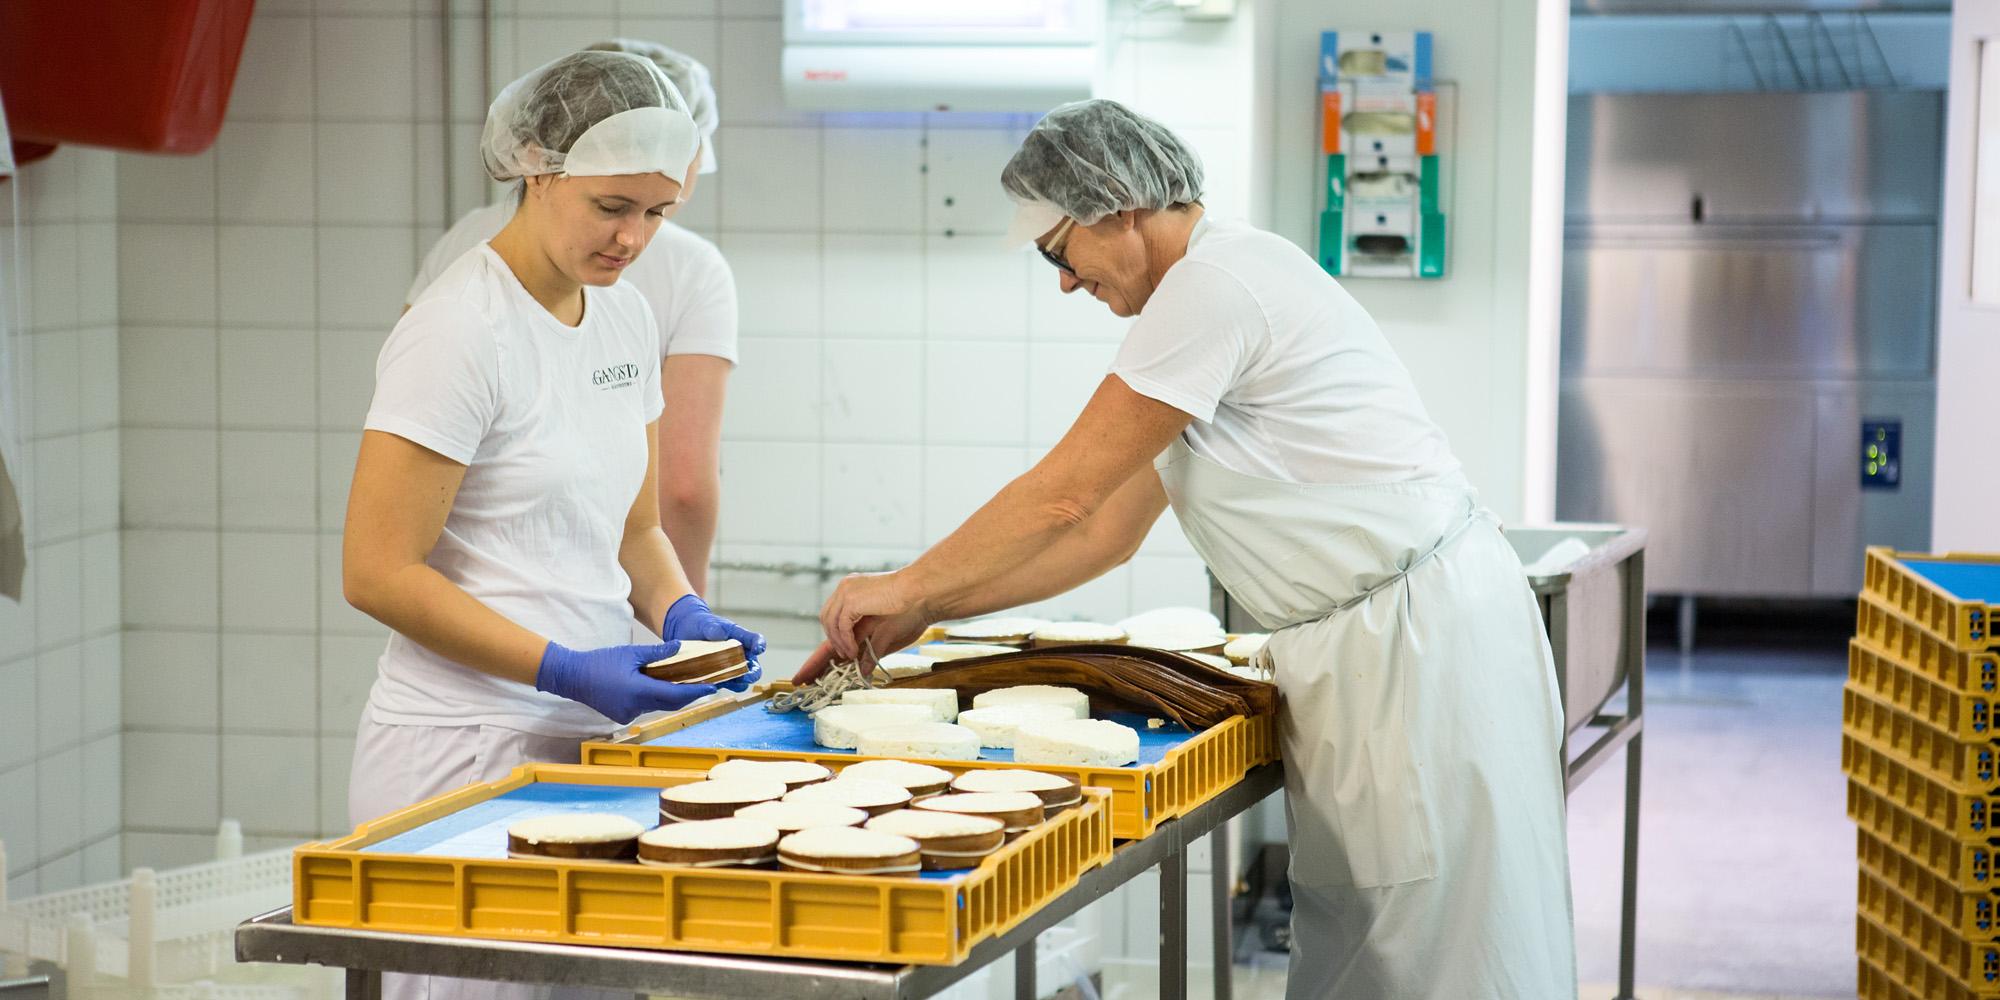 Inderøy Gangstad foto WilLee-Wright arbeid med osten i produksjonsrommet 2x1. Copyright: WilLee-Wright